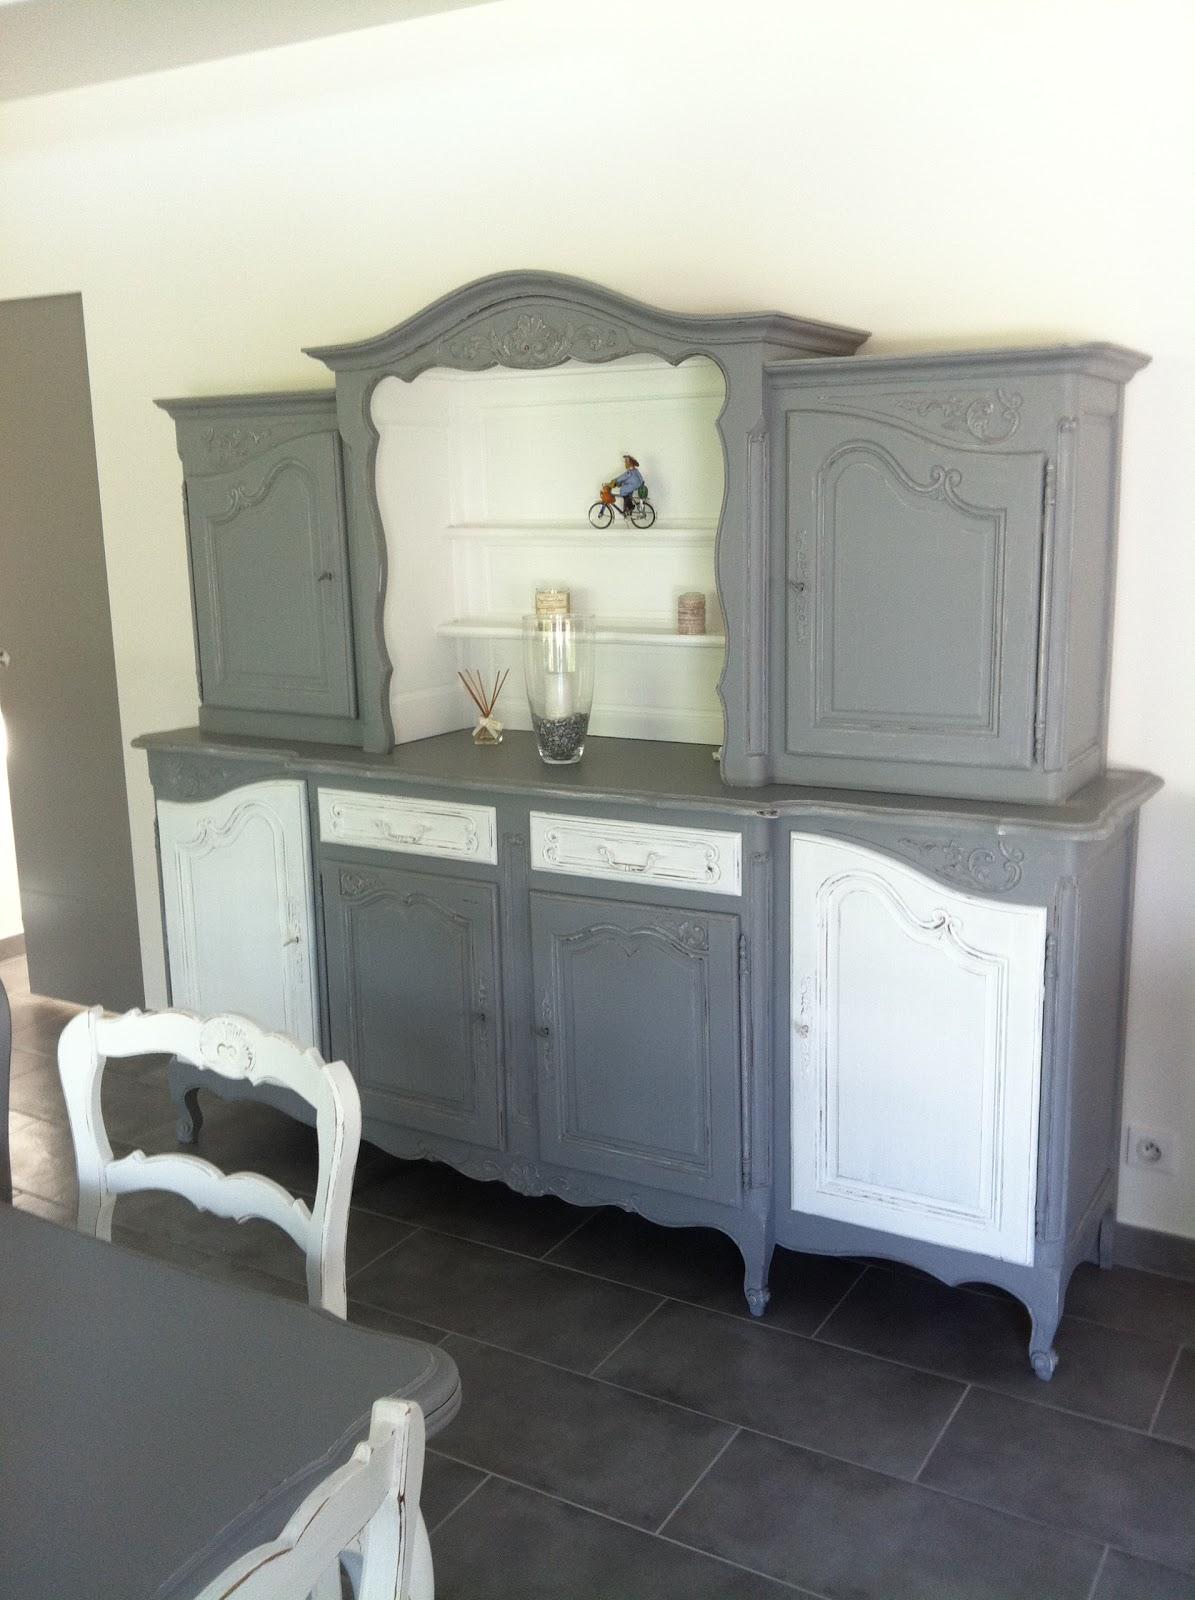 maison enfants maison enfant sur enperdresonlapin. Black Bedroom Furniture Sets. Home Design Ideas